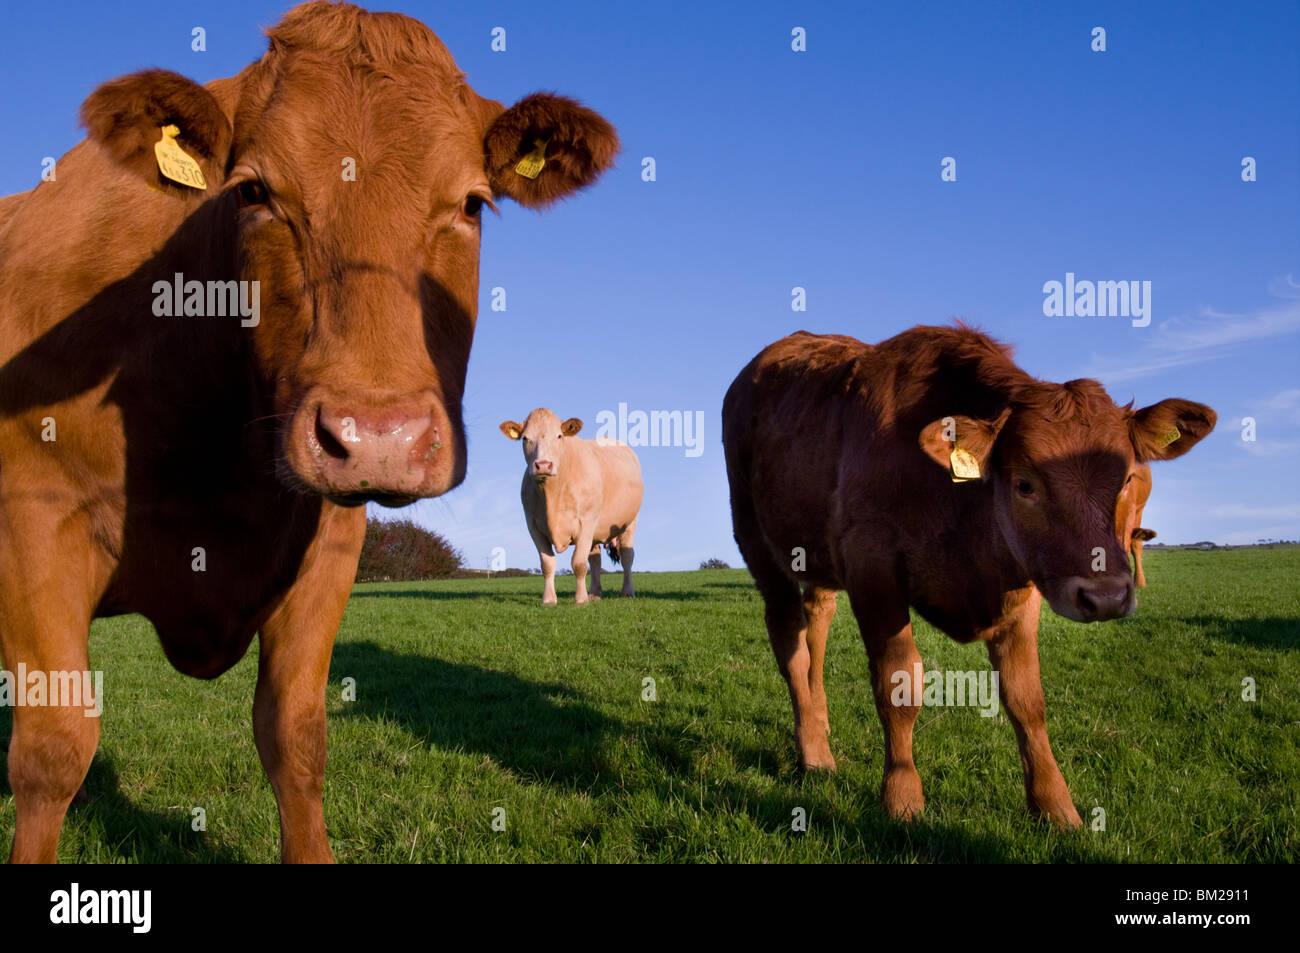 Close-up of cattle, north Exmoor, Devon, UK - Stock Image